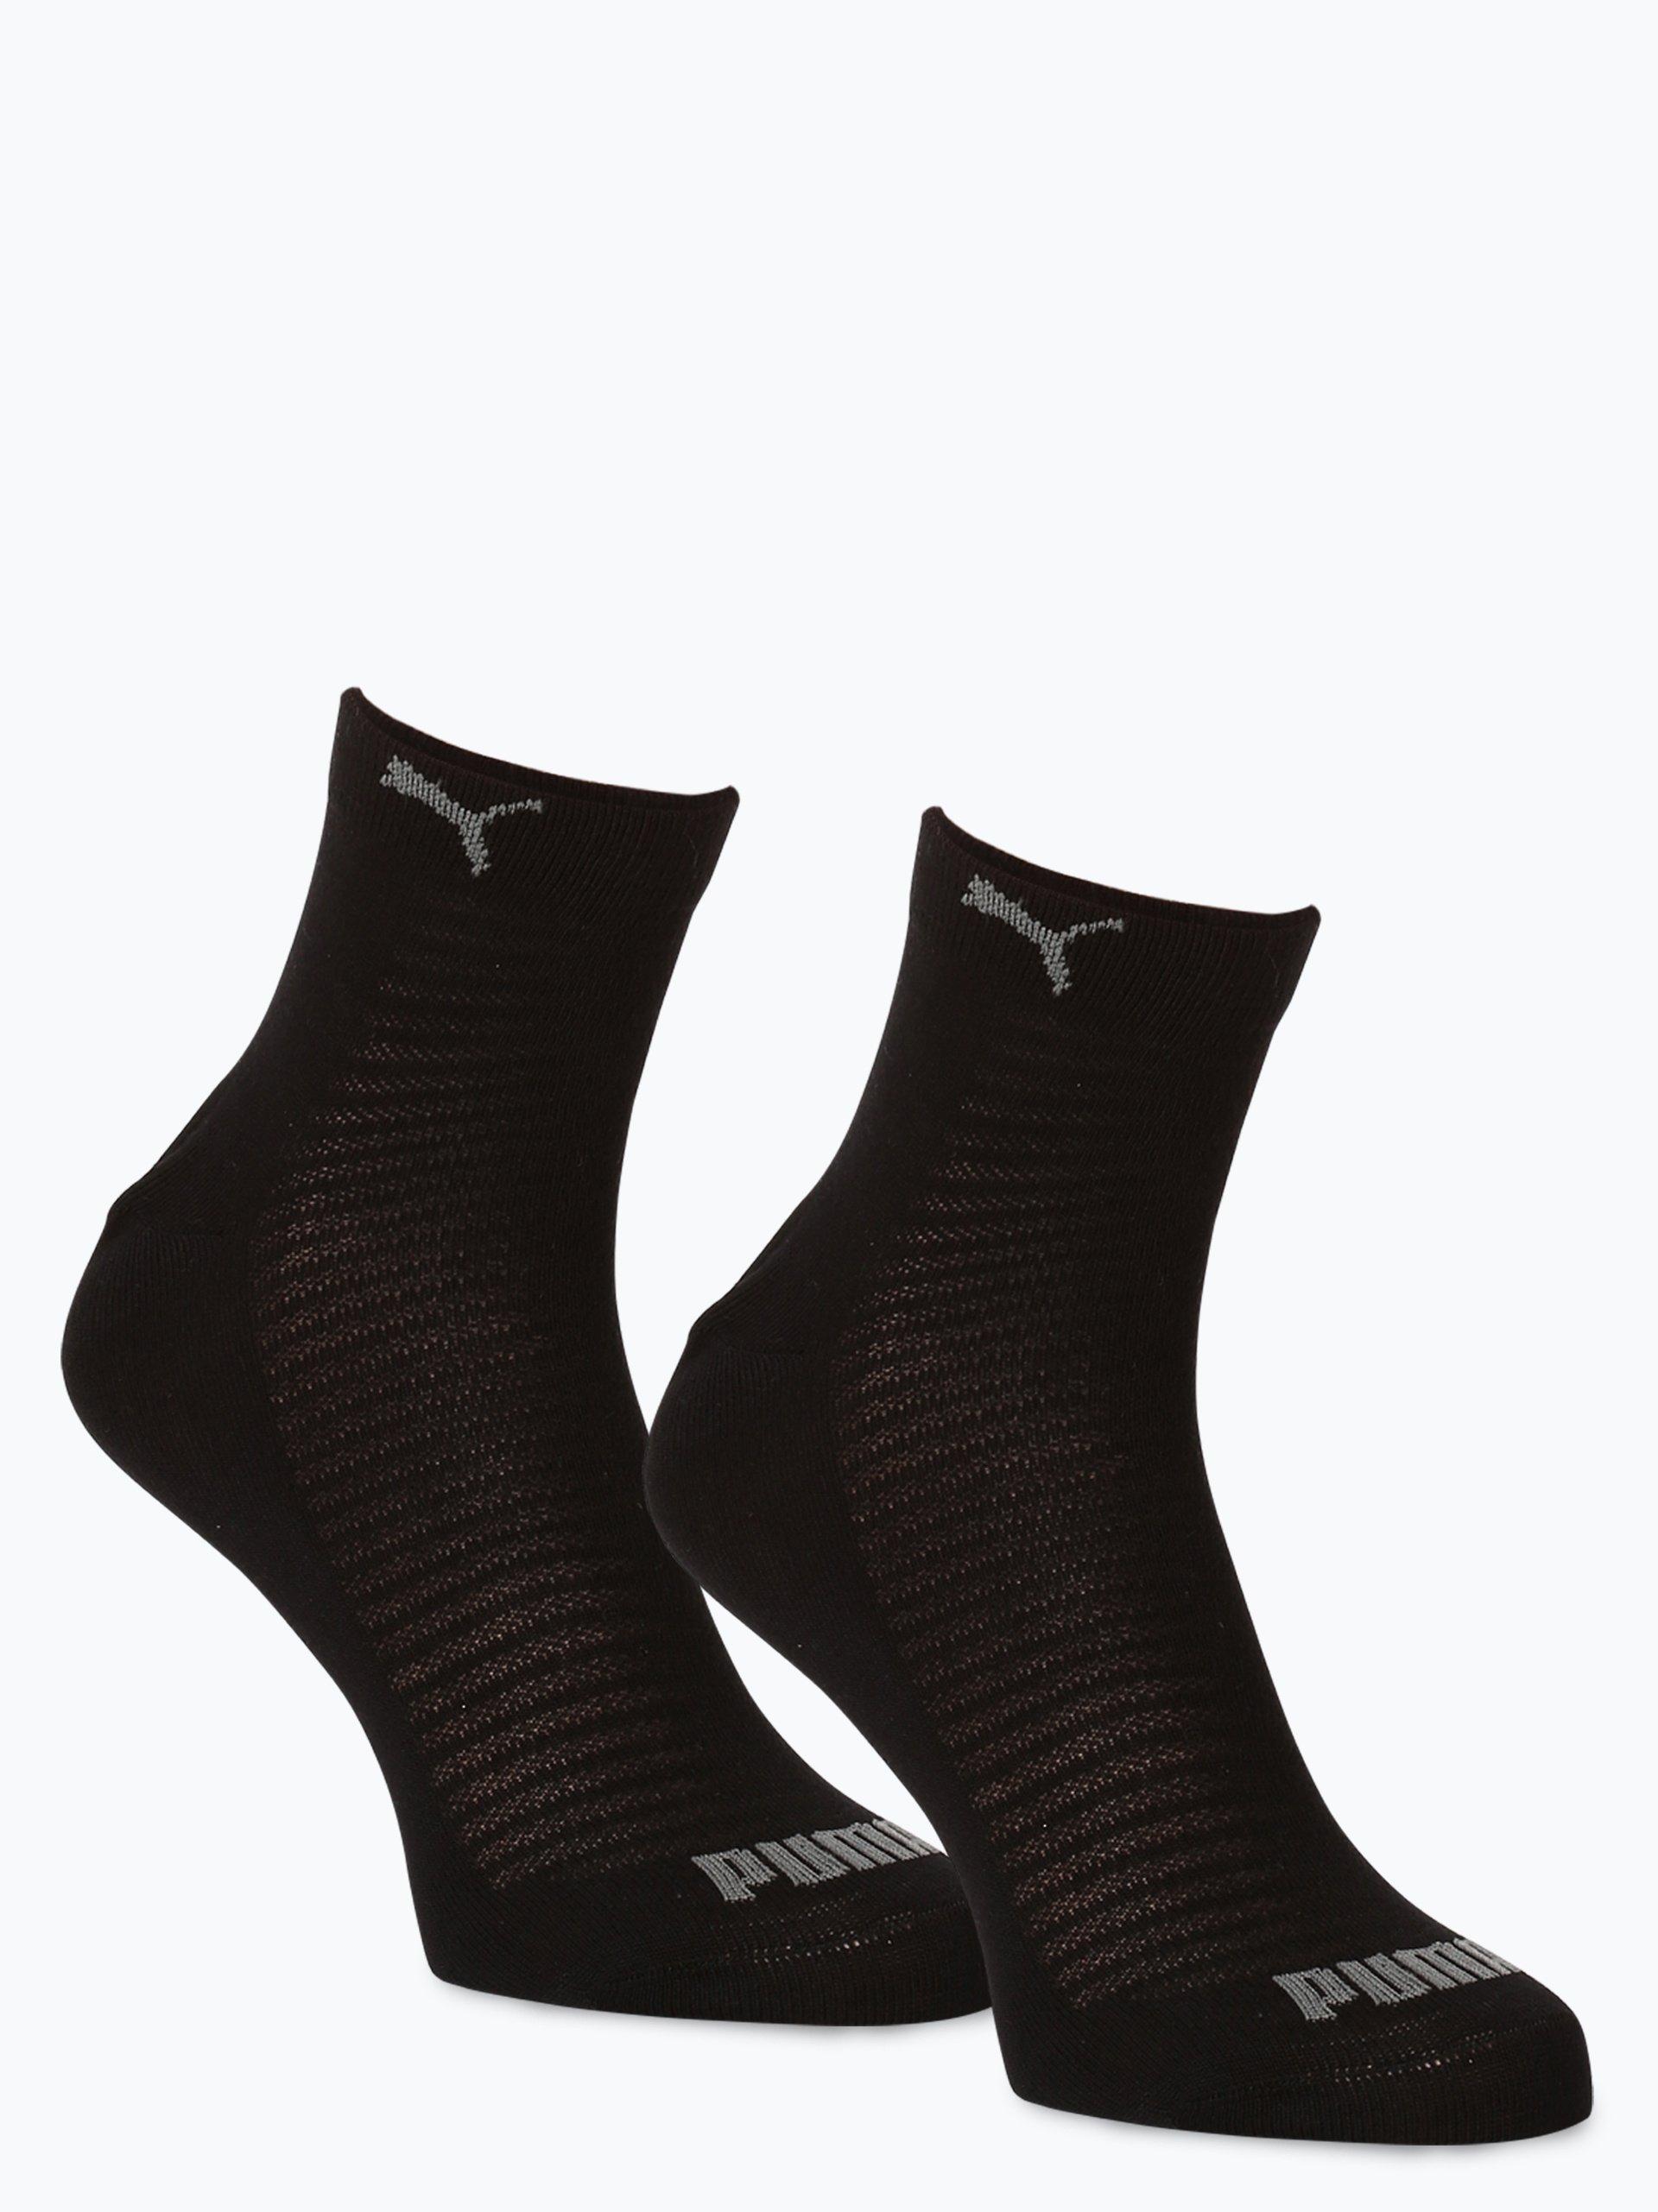 Puma Damen Sneakersocken im 2er-Pack